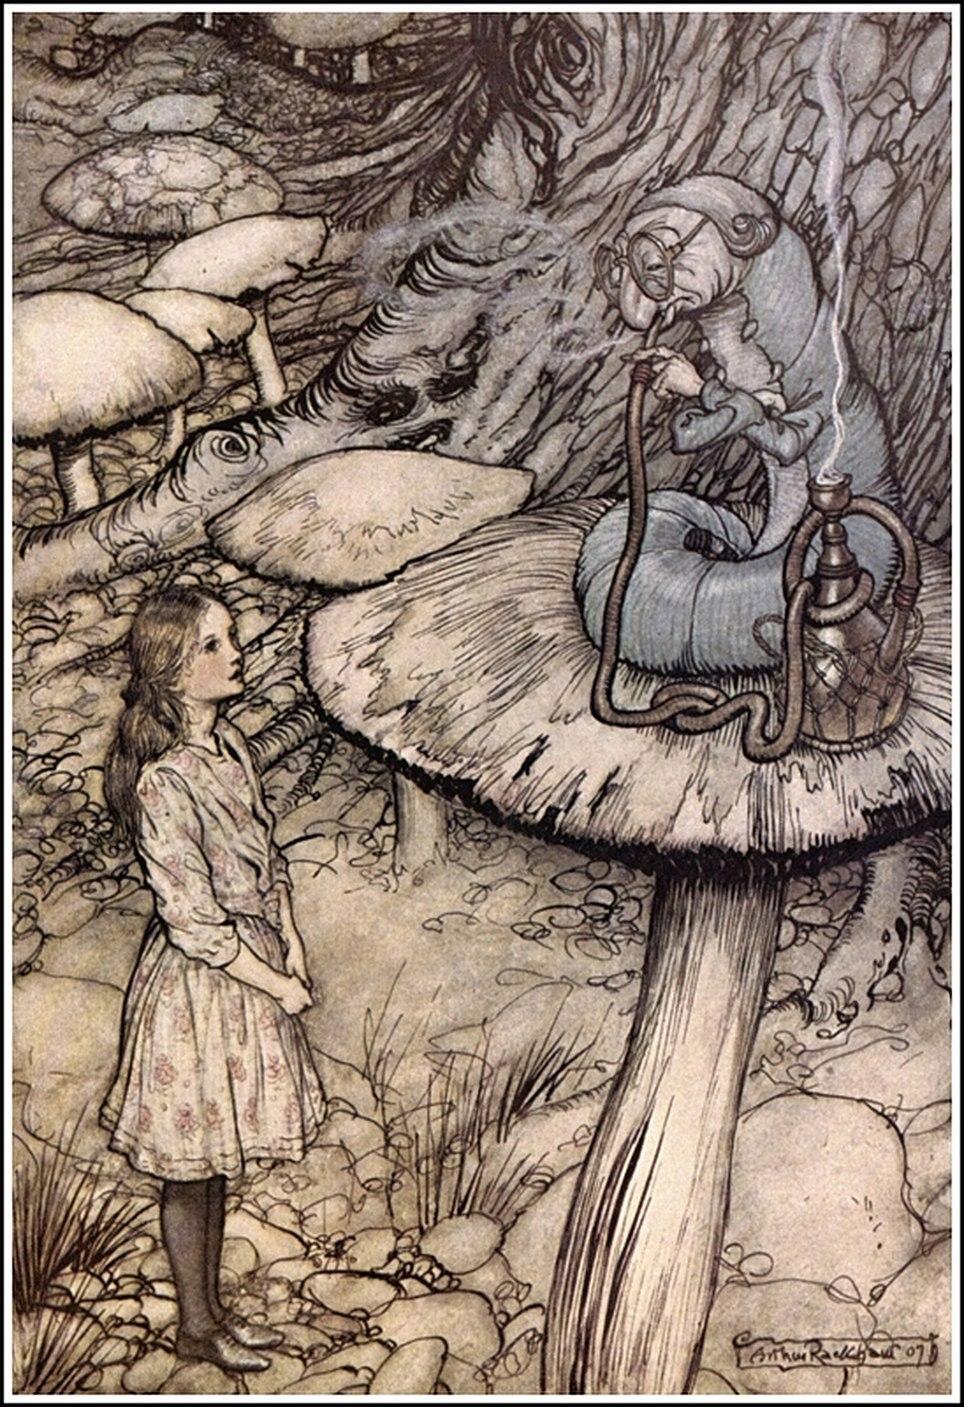 Alice in Wonderland by Arthur Rackham - 05 - Advice from a Caterpillar